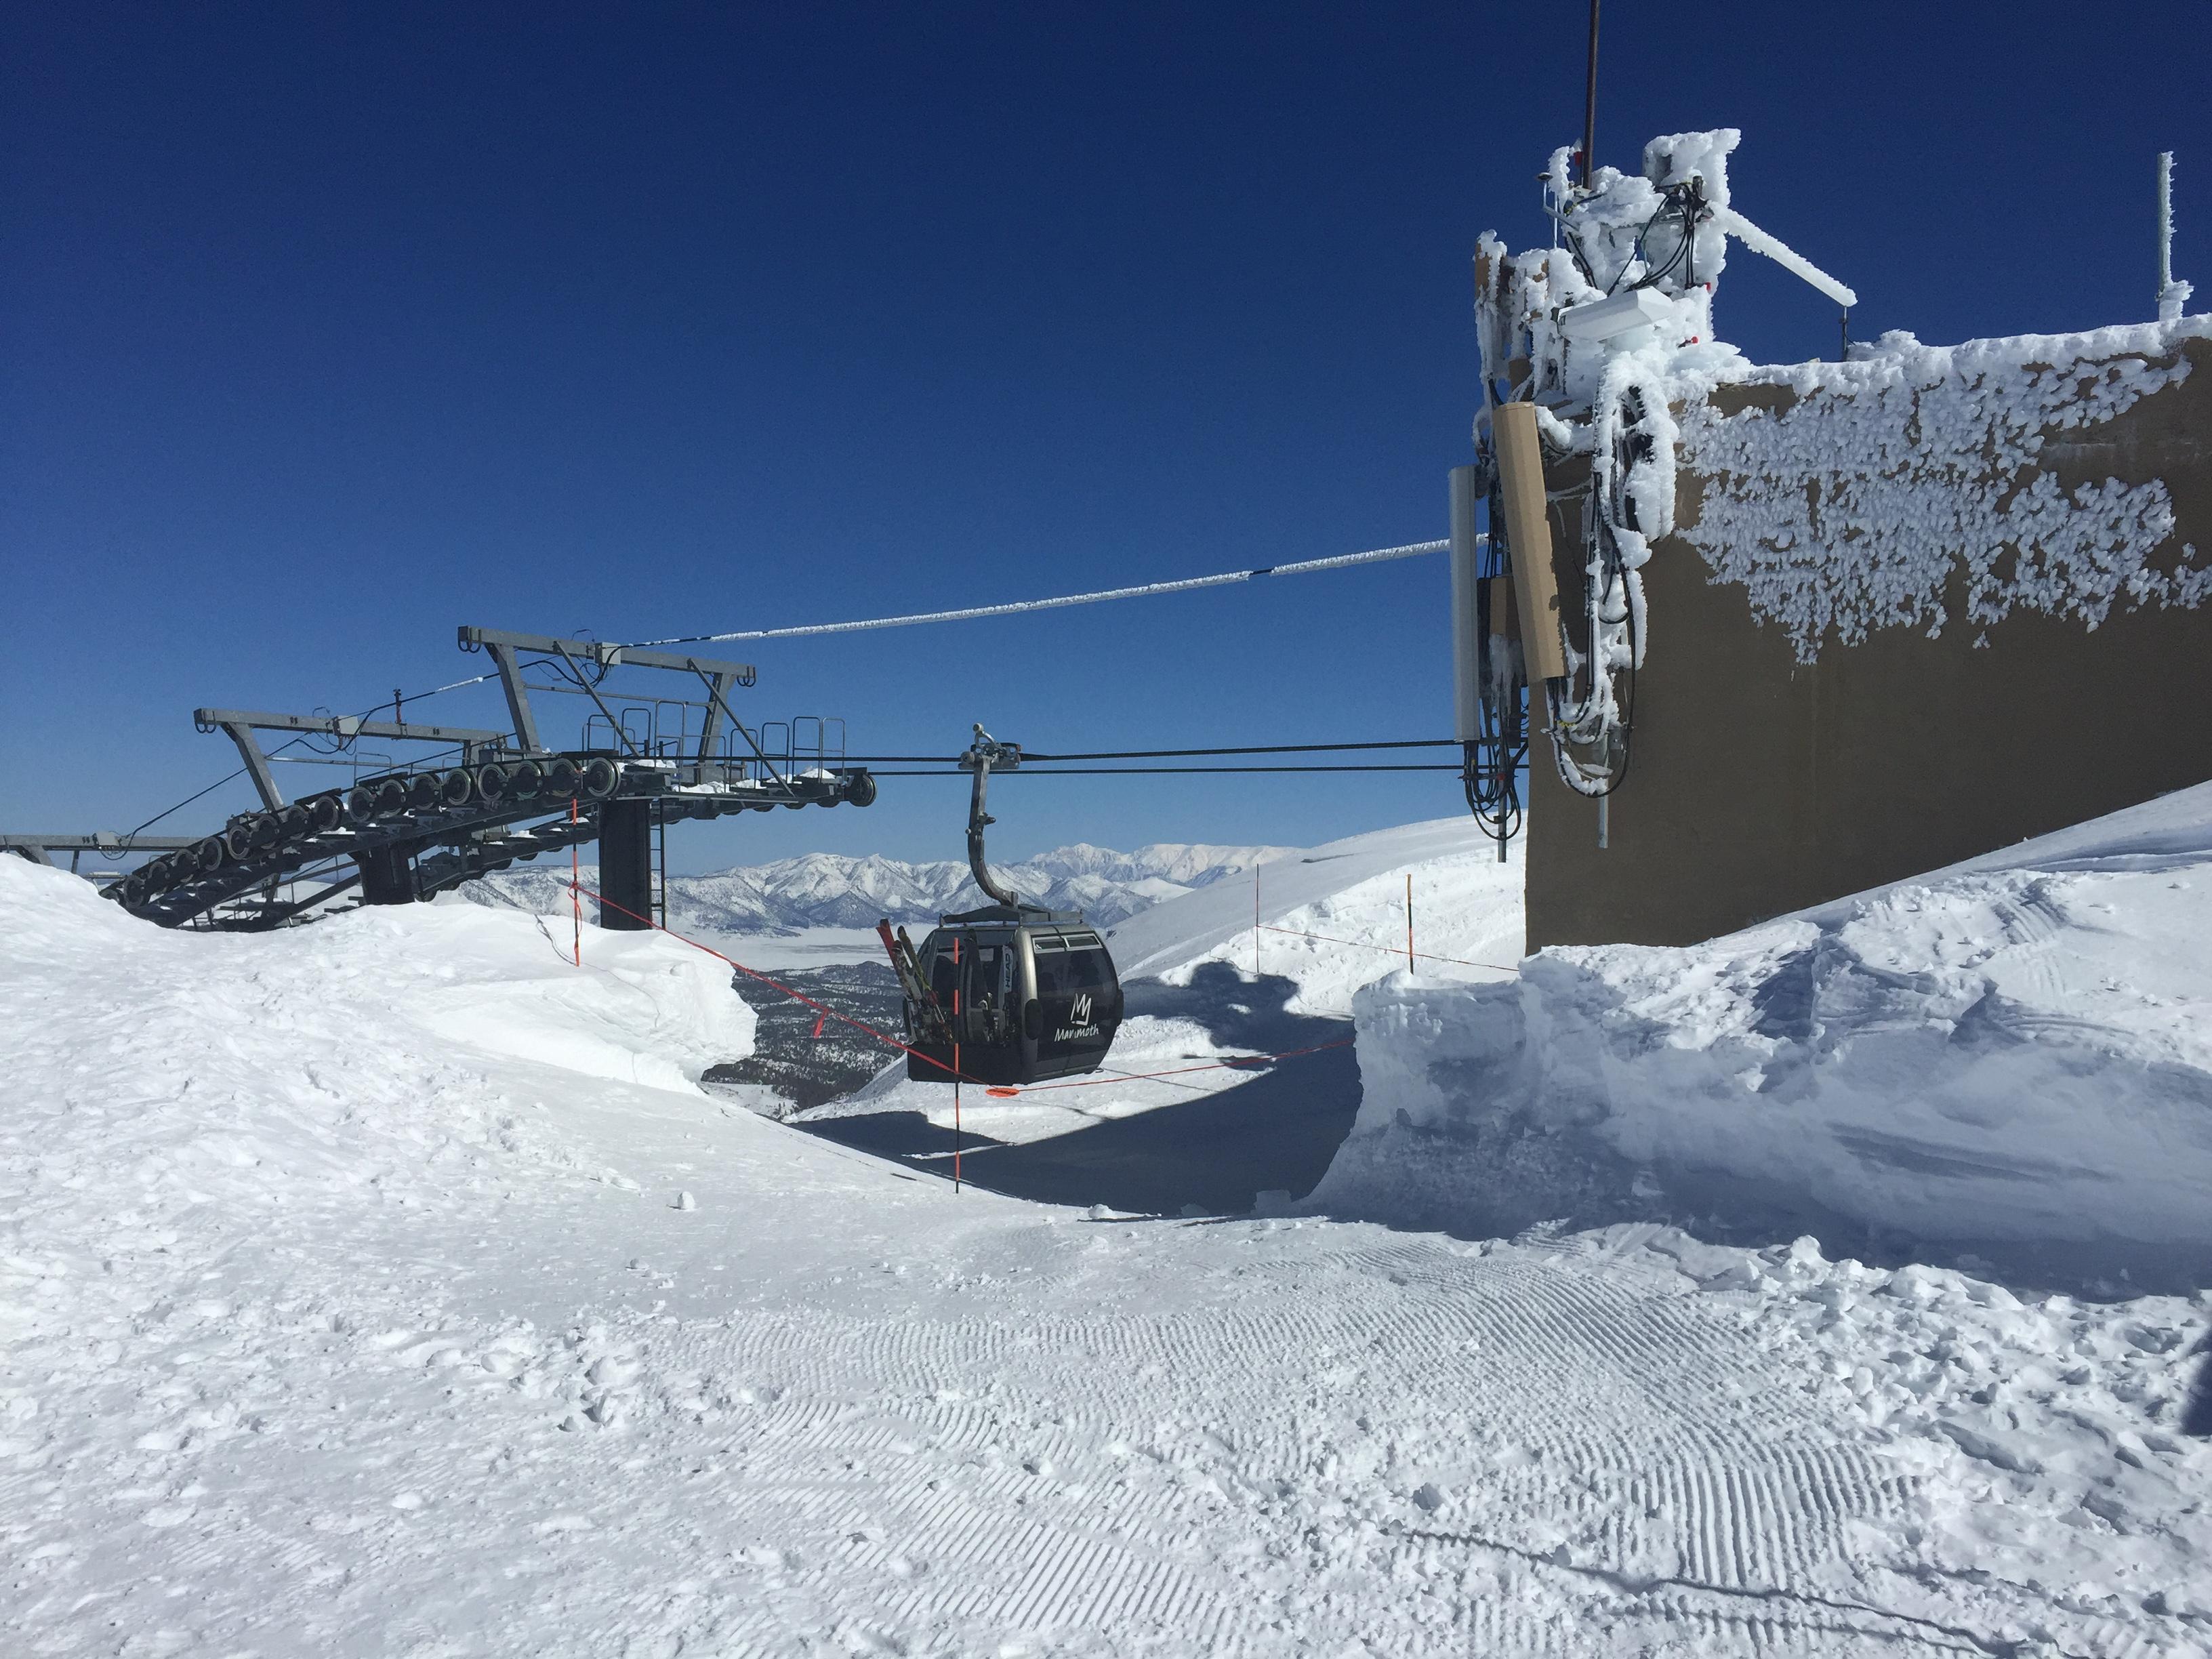 Top of Mammoth Mountain Ski Area on February 14, 2017